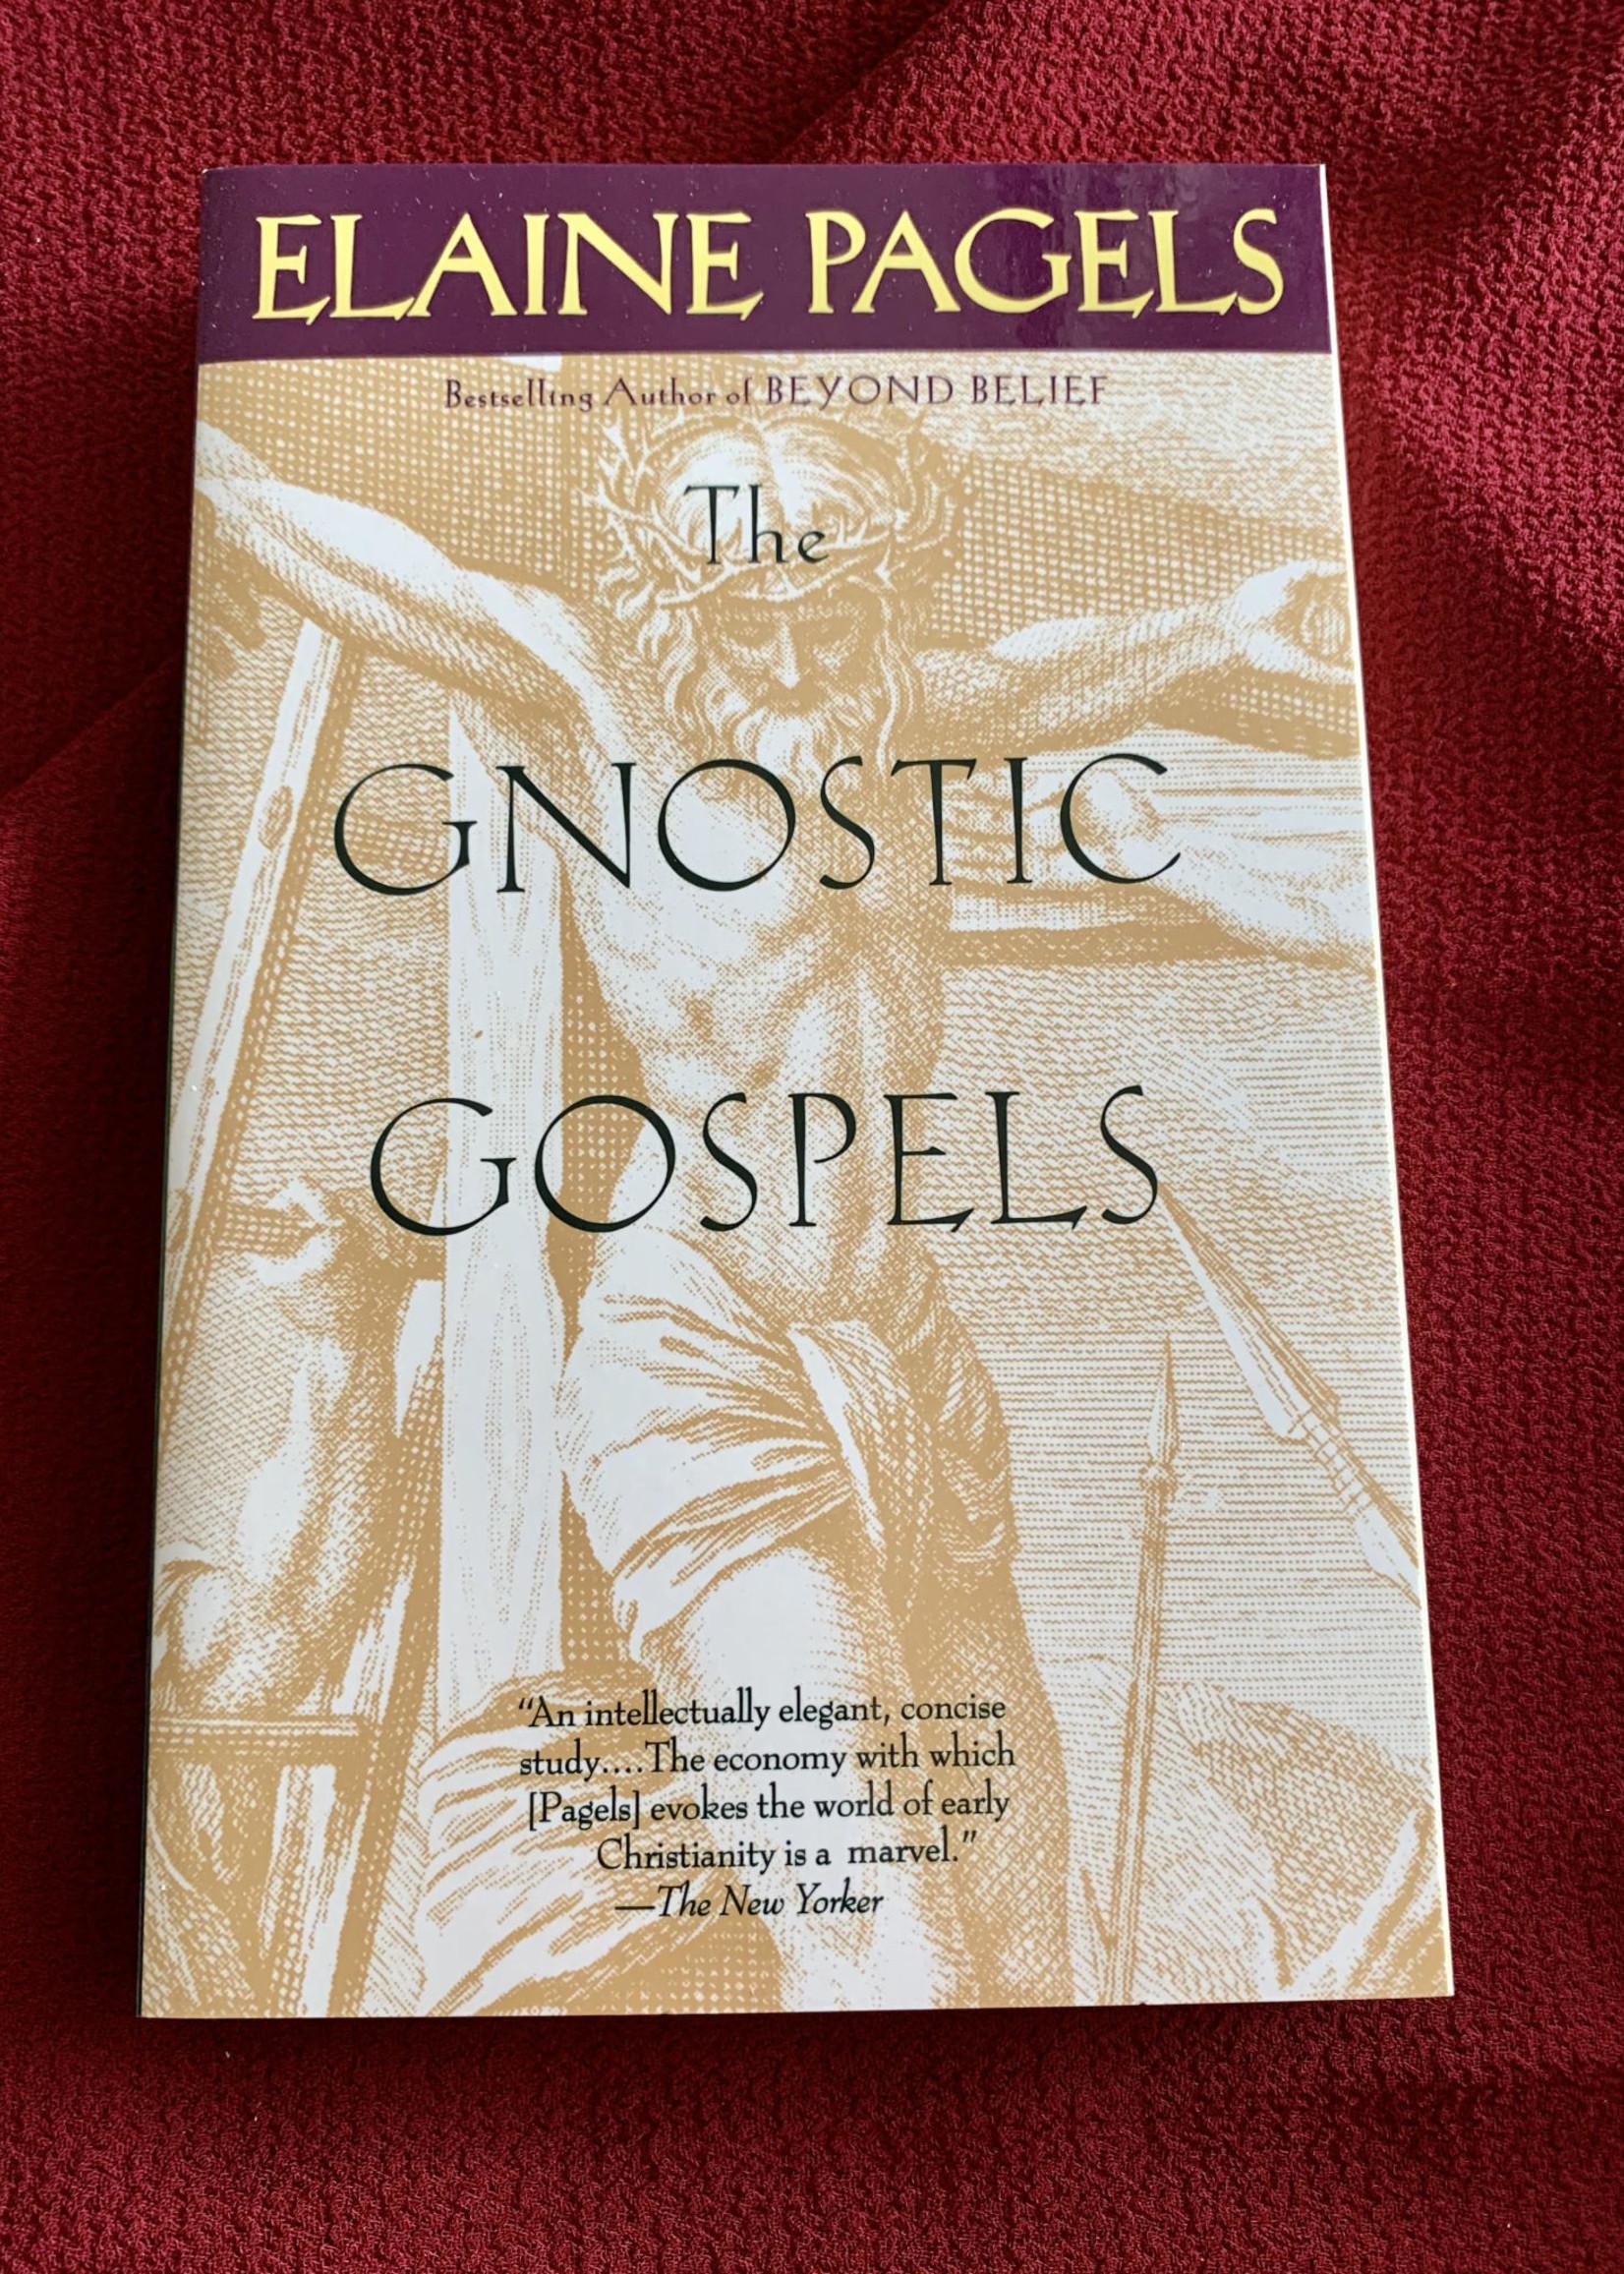 The Gnostic Gospels - Elaine Pagels